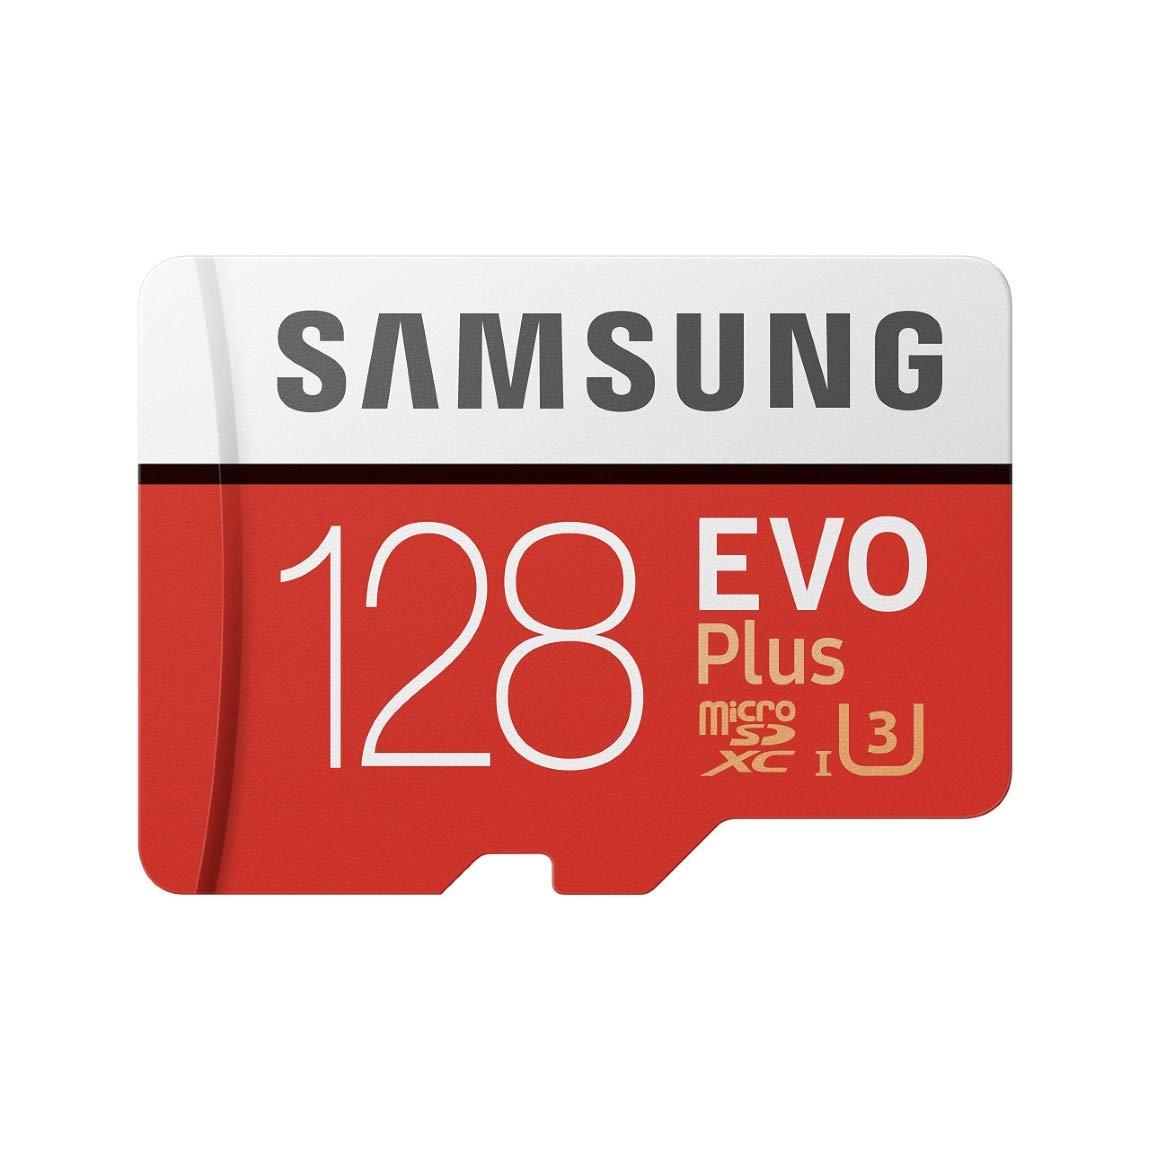 Samsung 128GB EVO Plus Class 10 Micro SDXC with Adapter